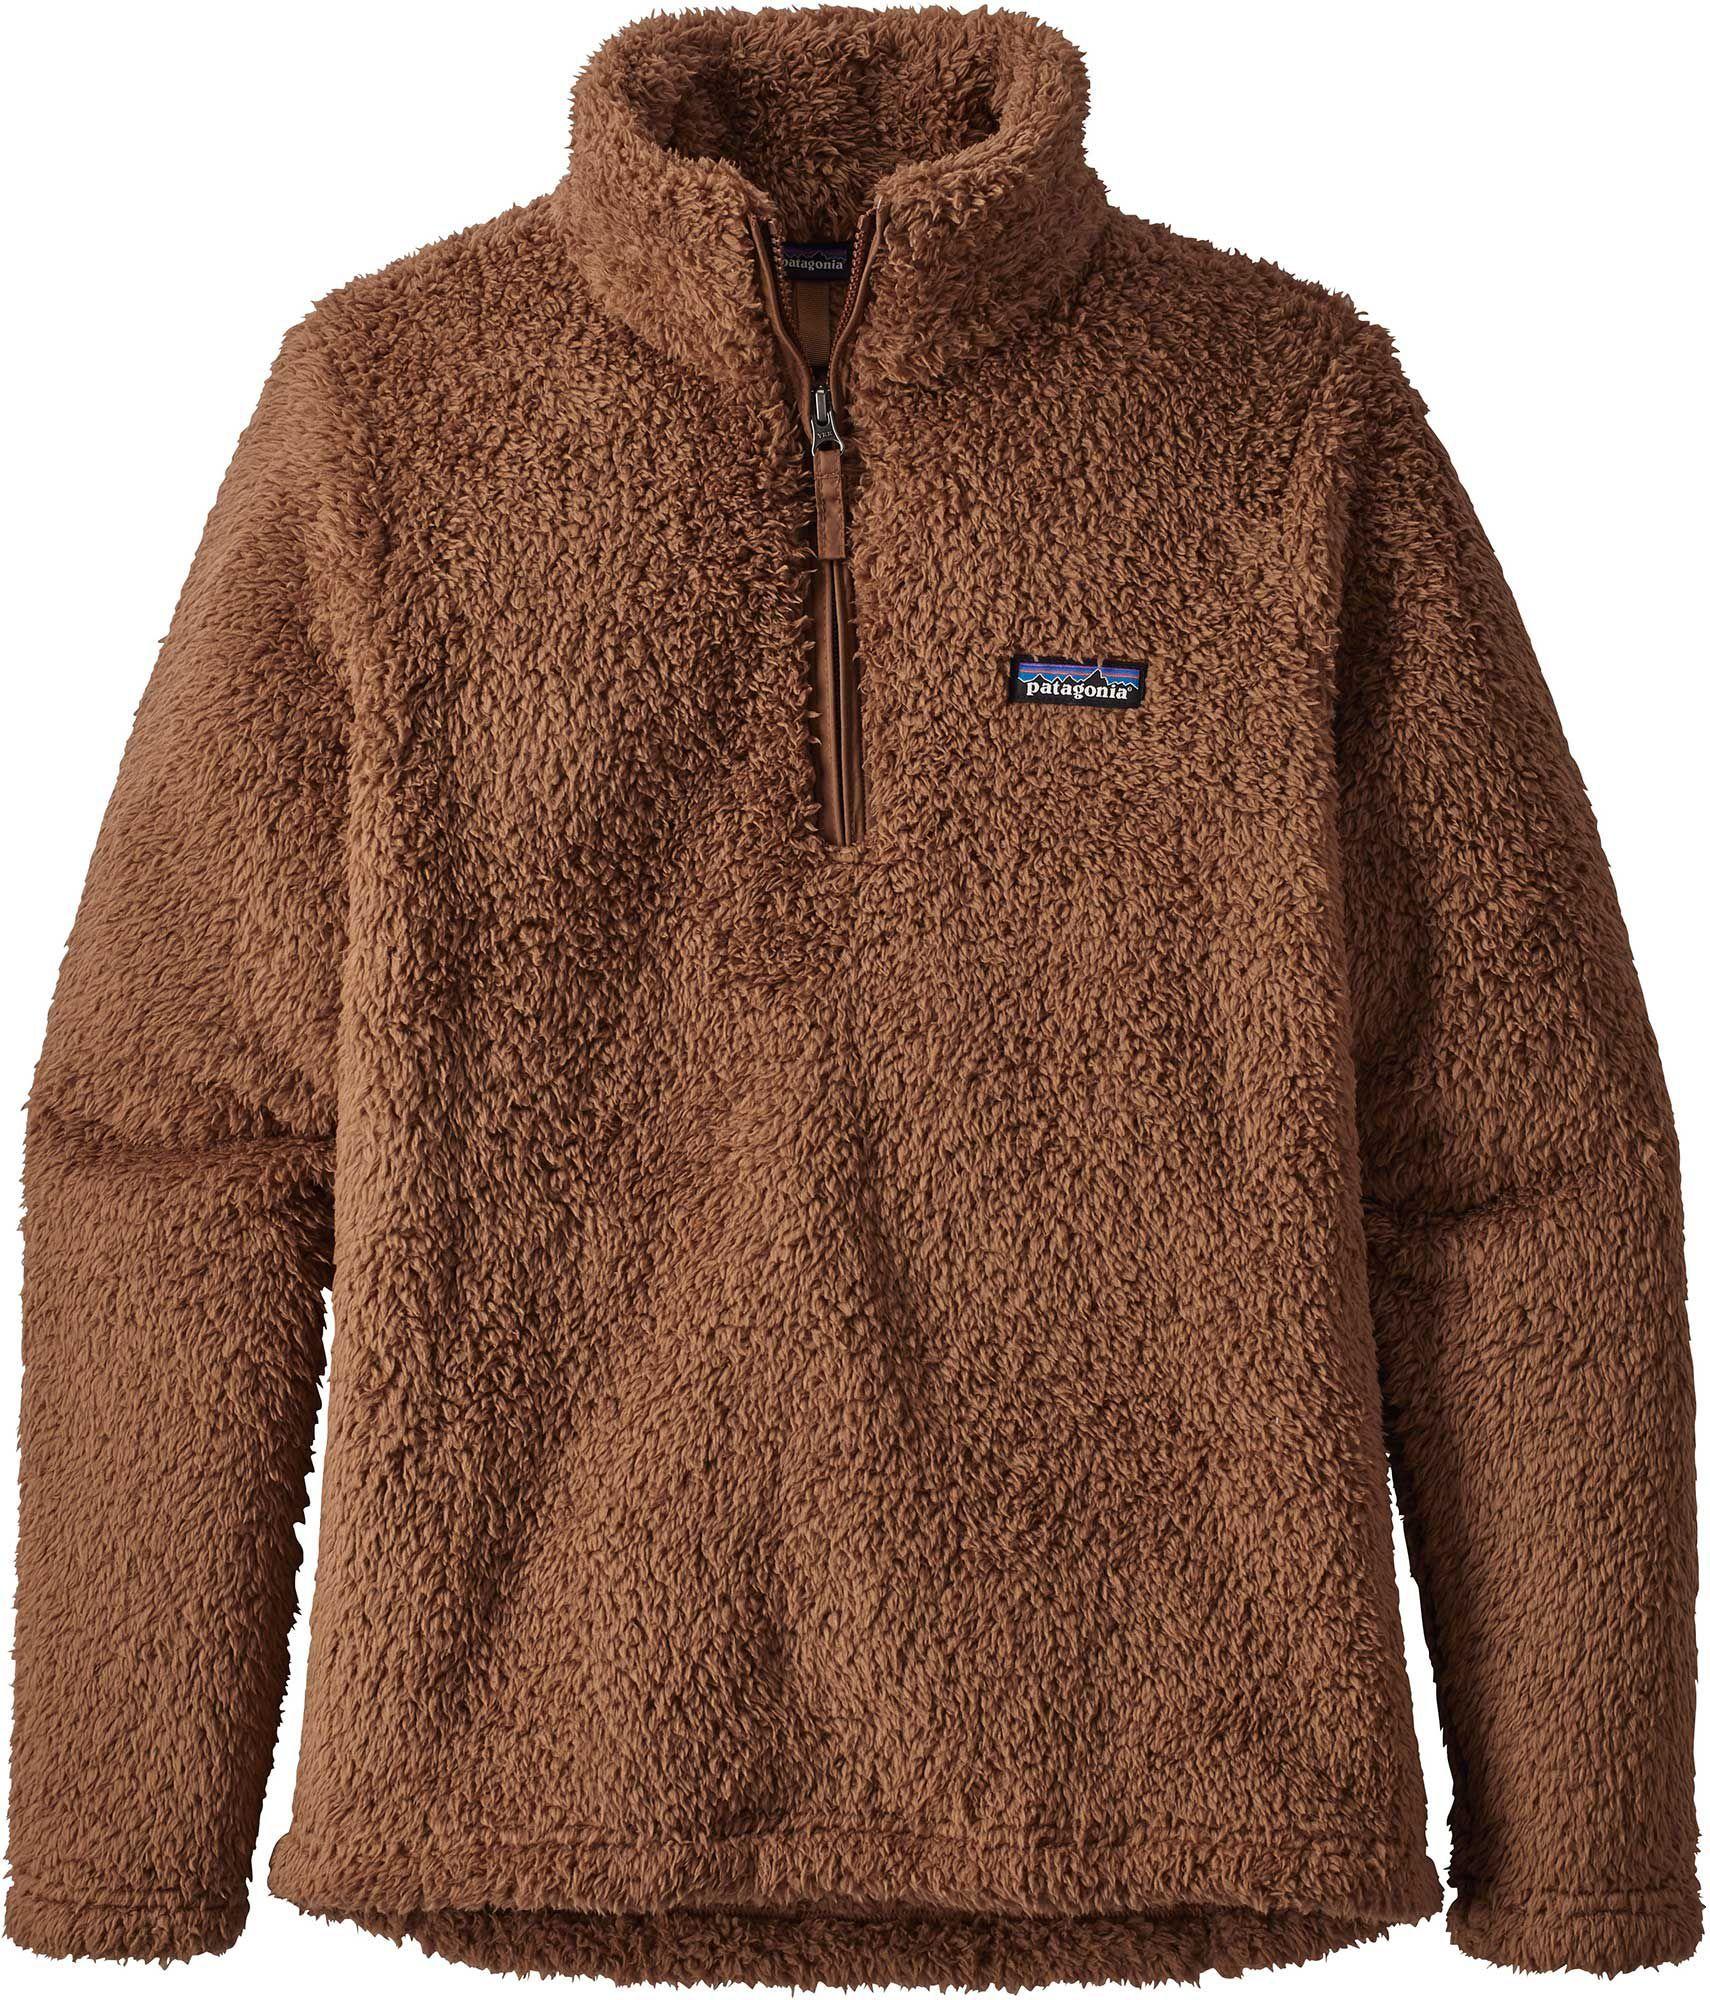 Patagonia Women's Los Gatos Quarter Zip Fleece Pullover